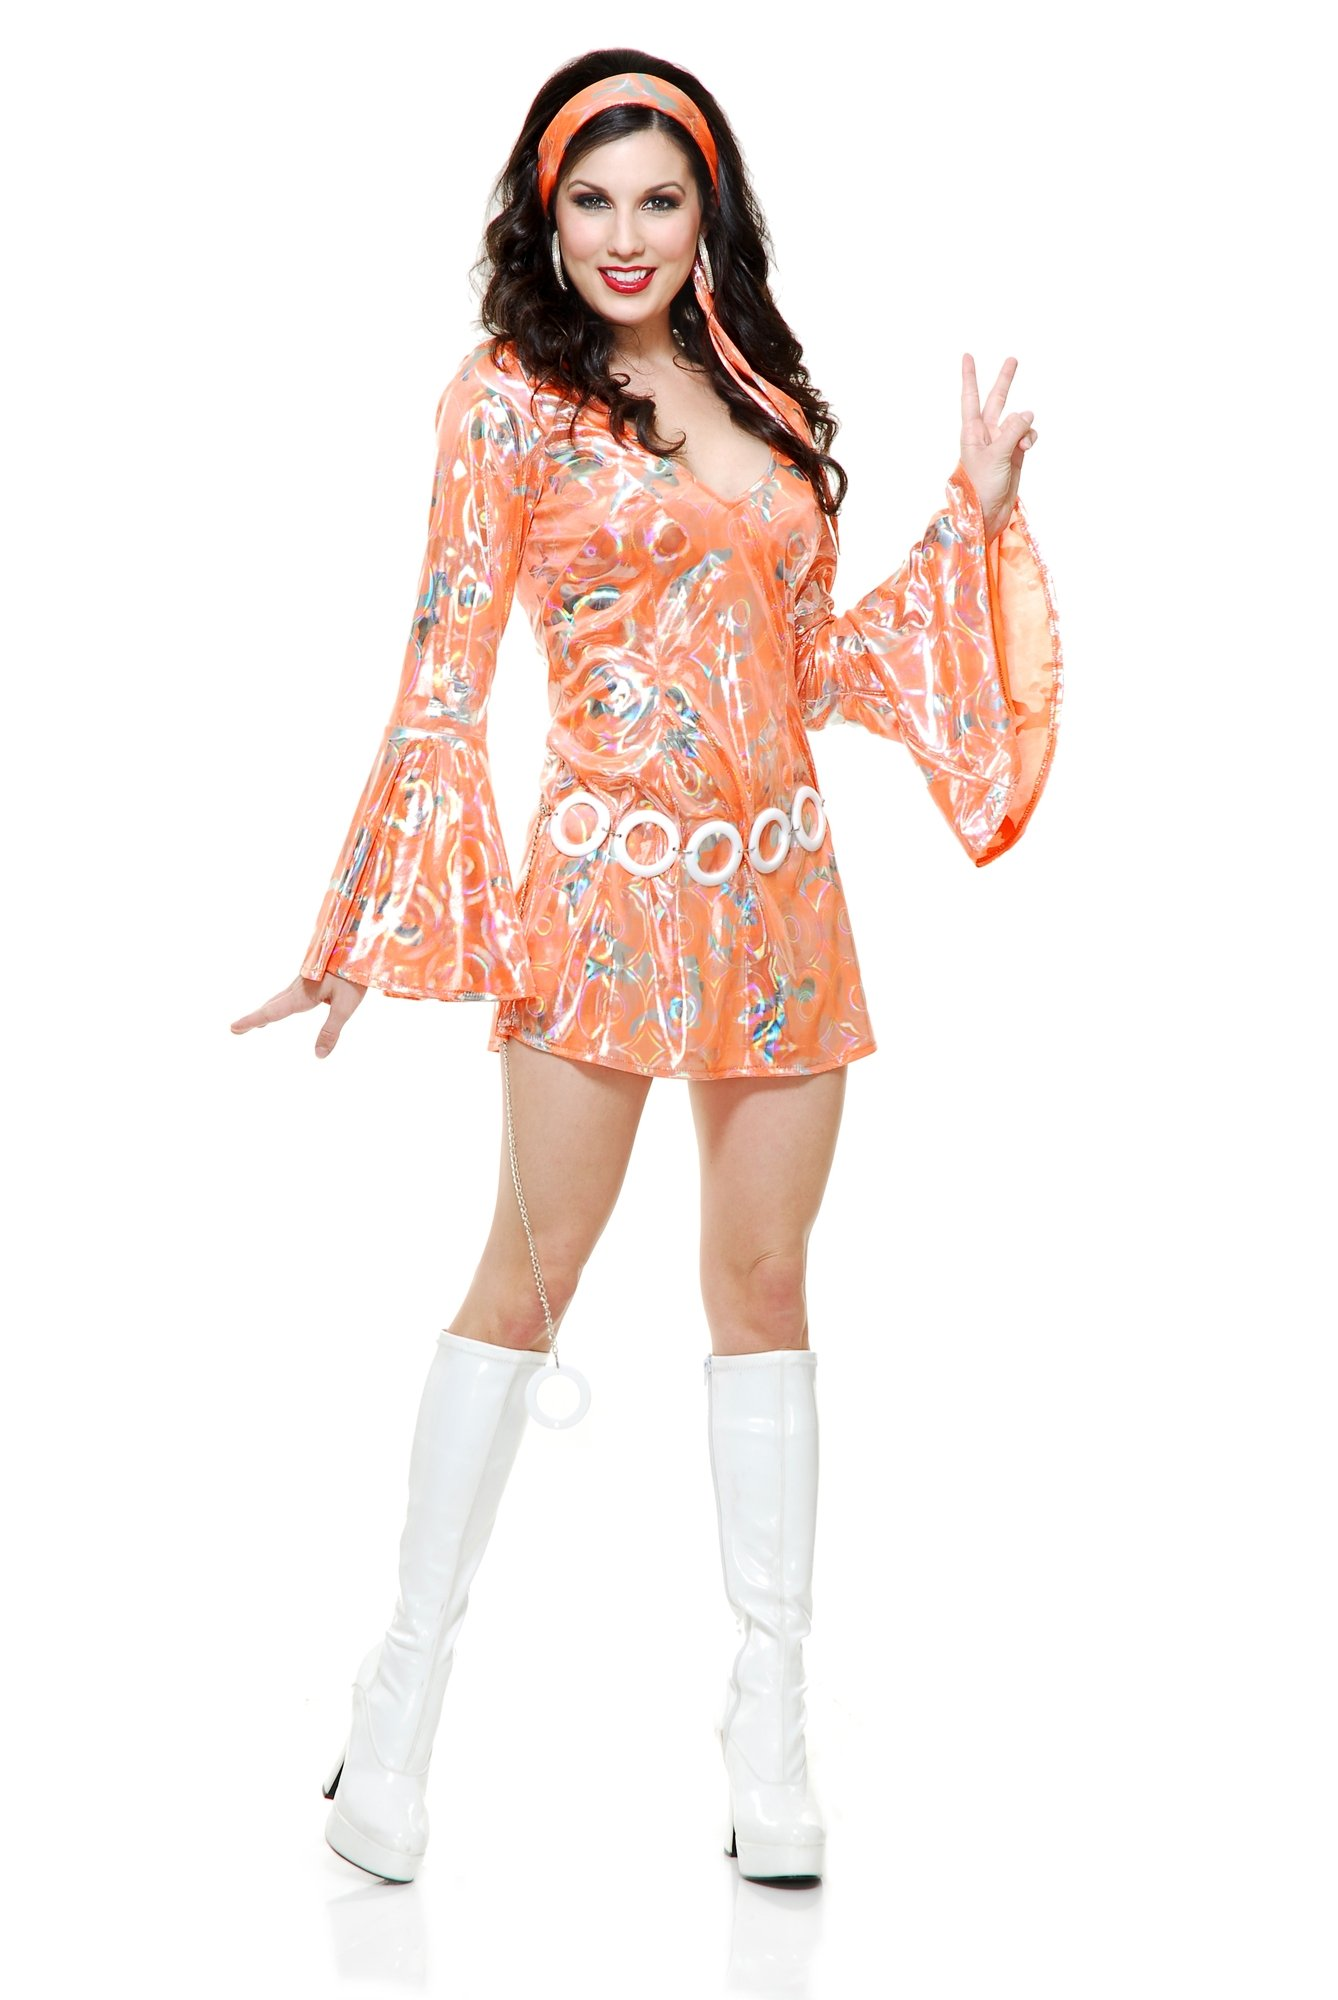 Charades Women's Disco Queen Costume Dress